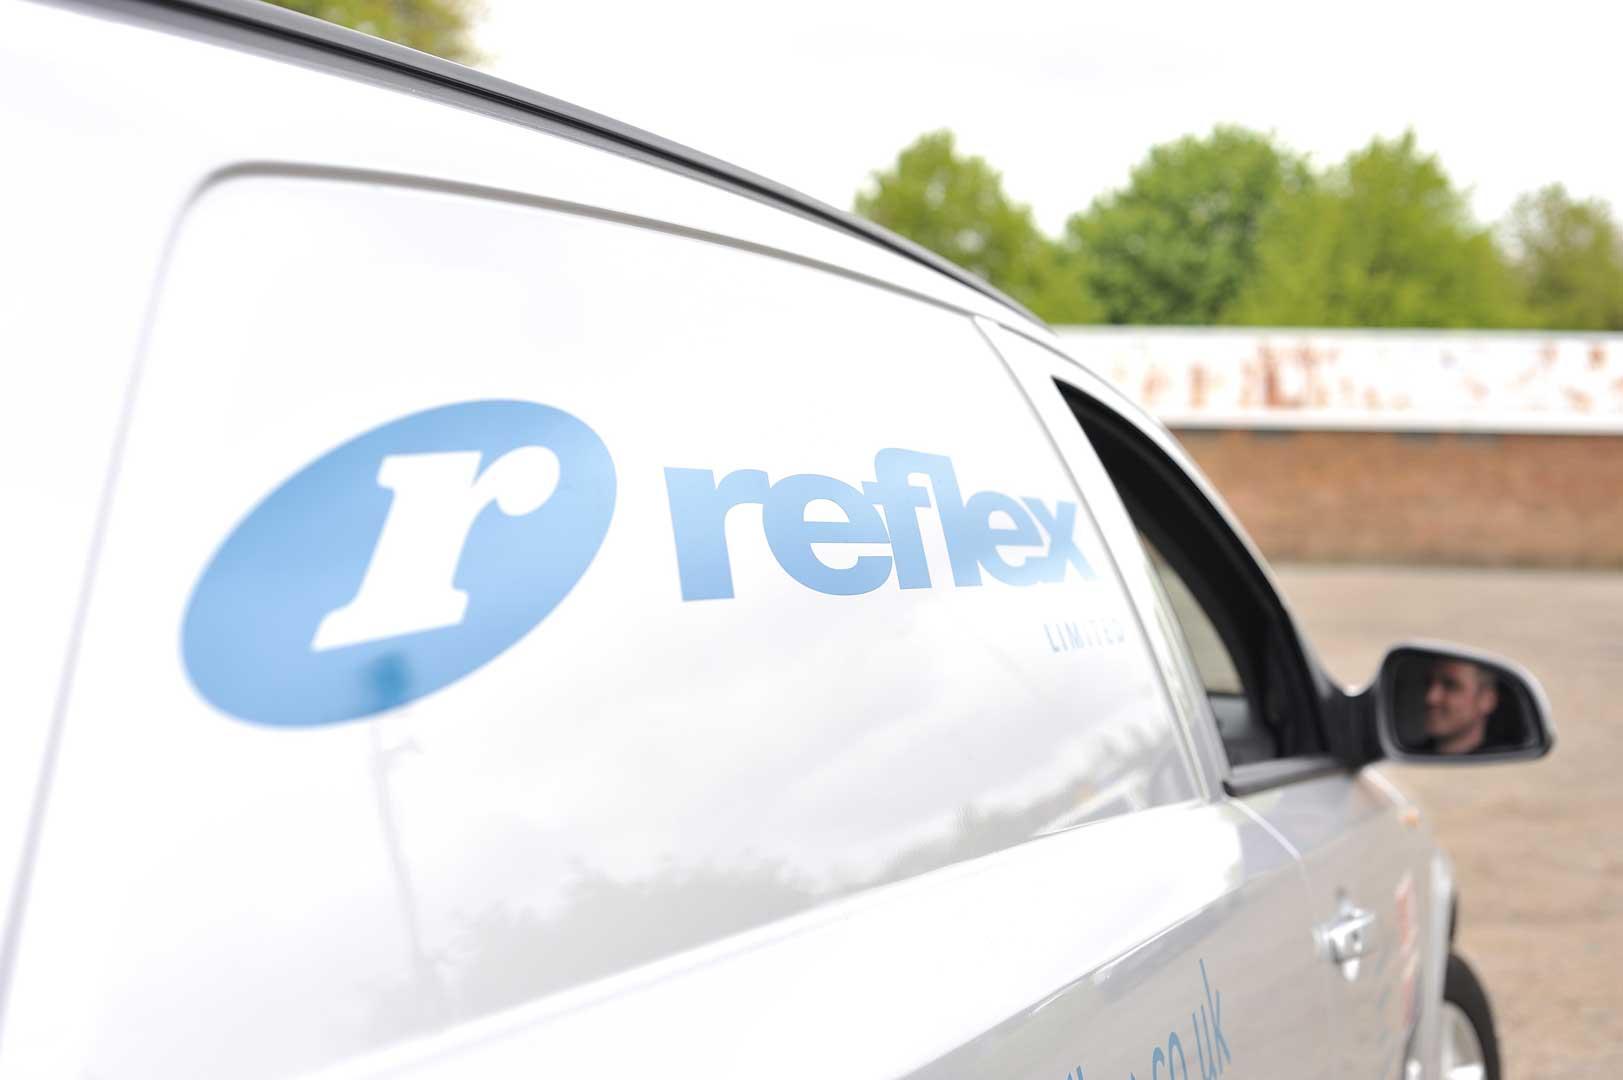 Reflex Van logo